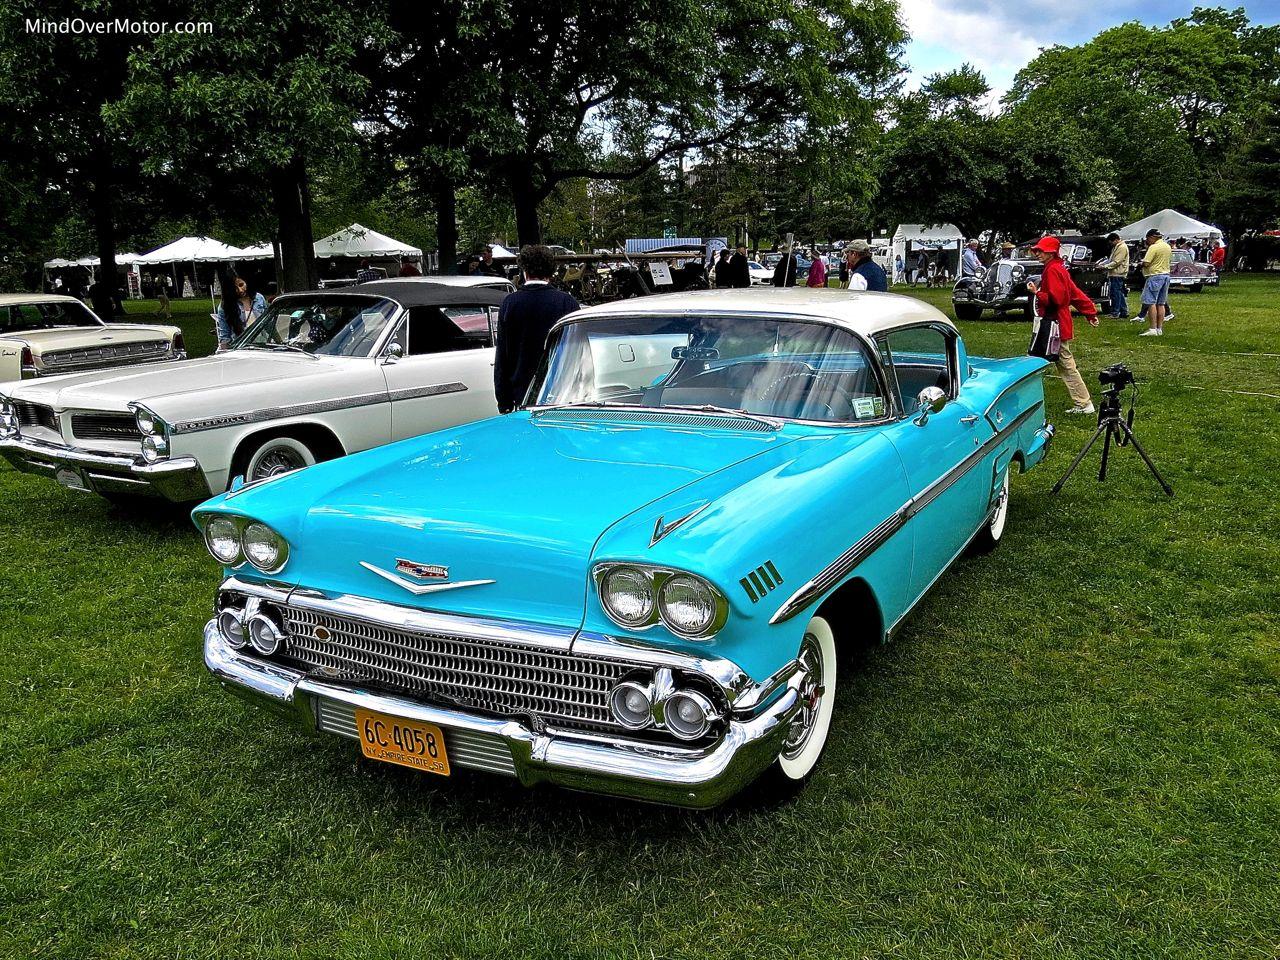 1958 Chevrolet Impala Front